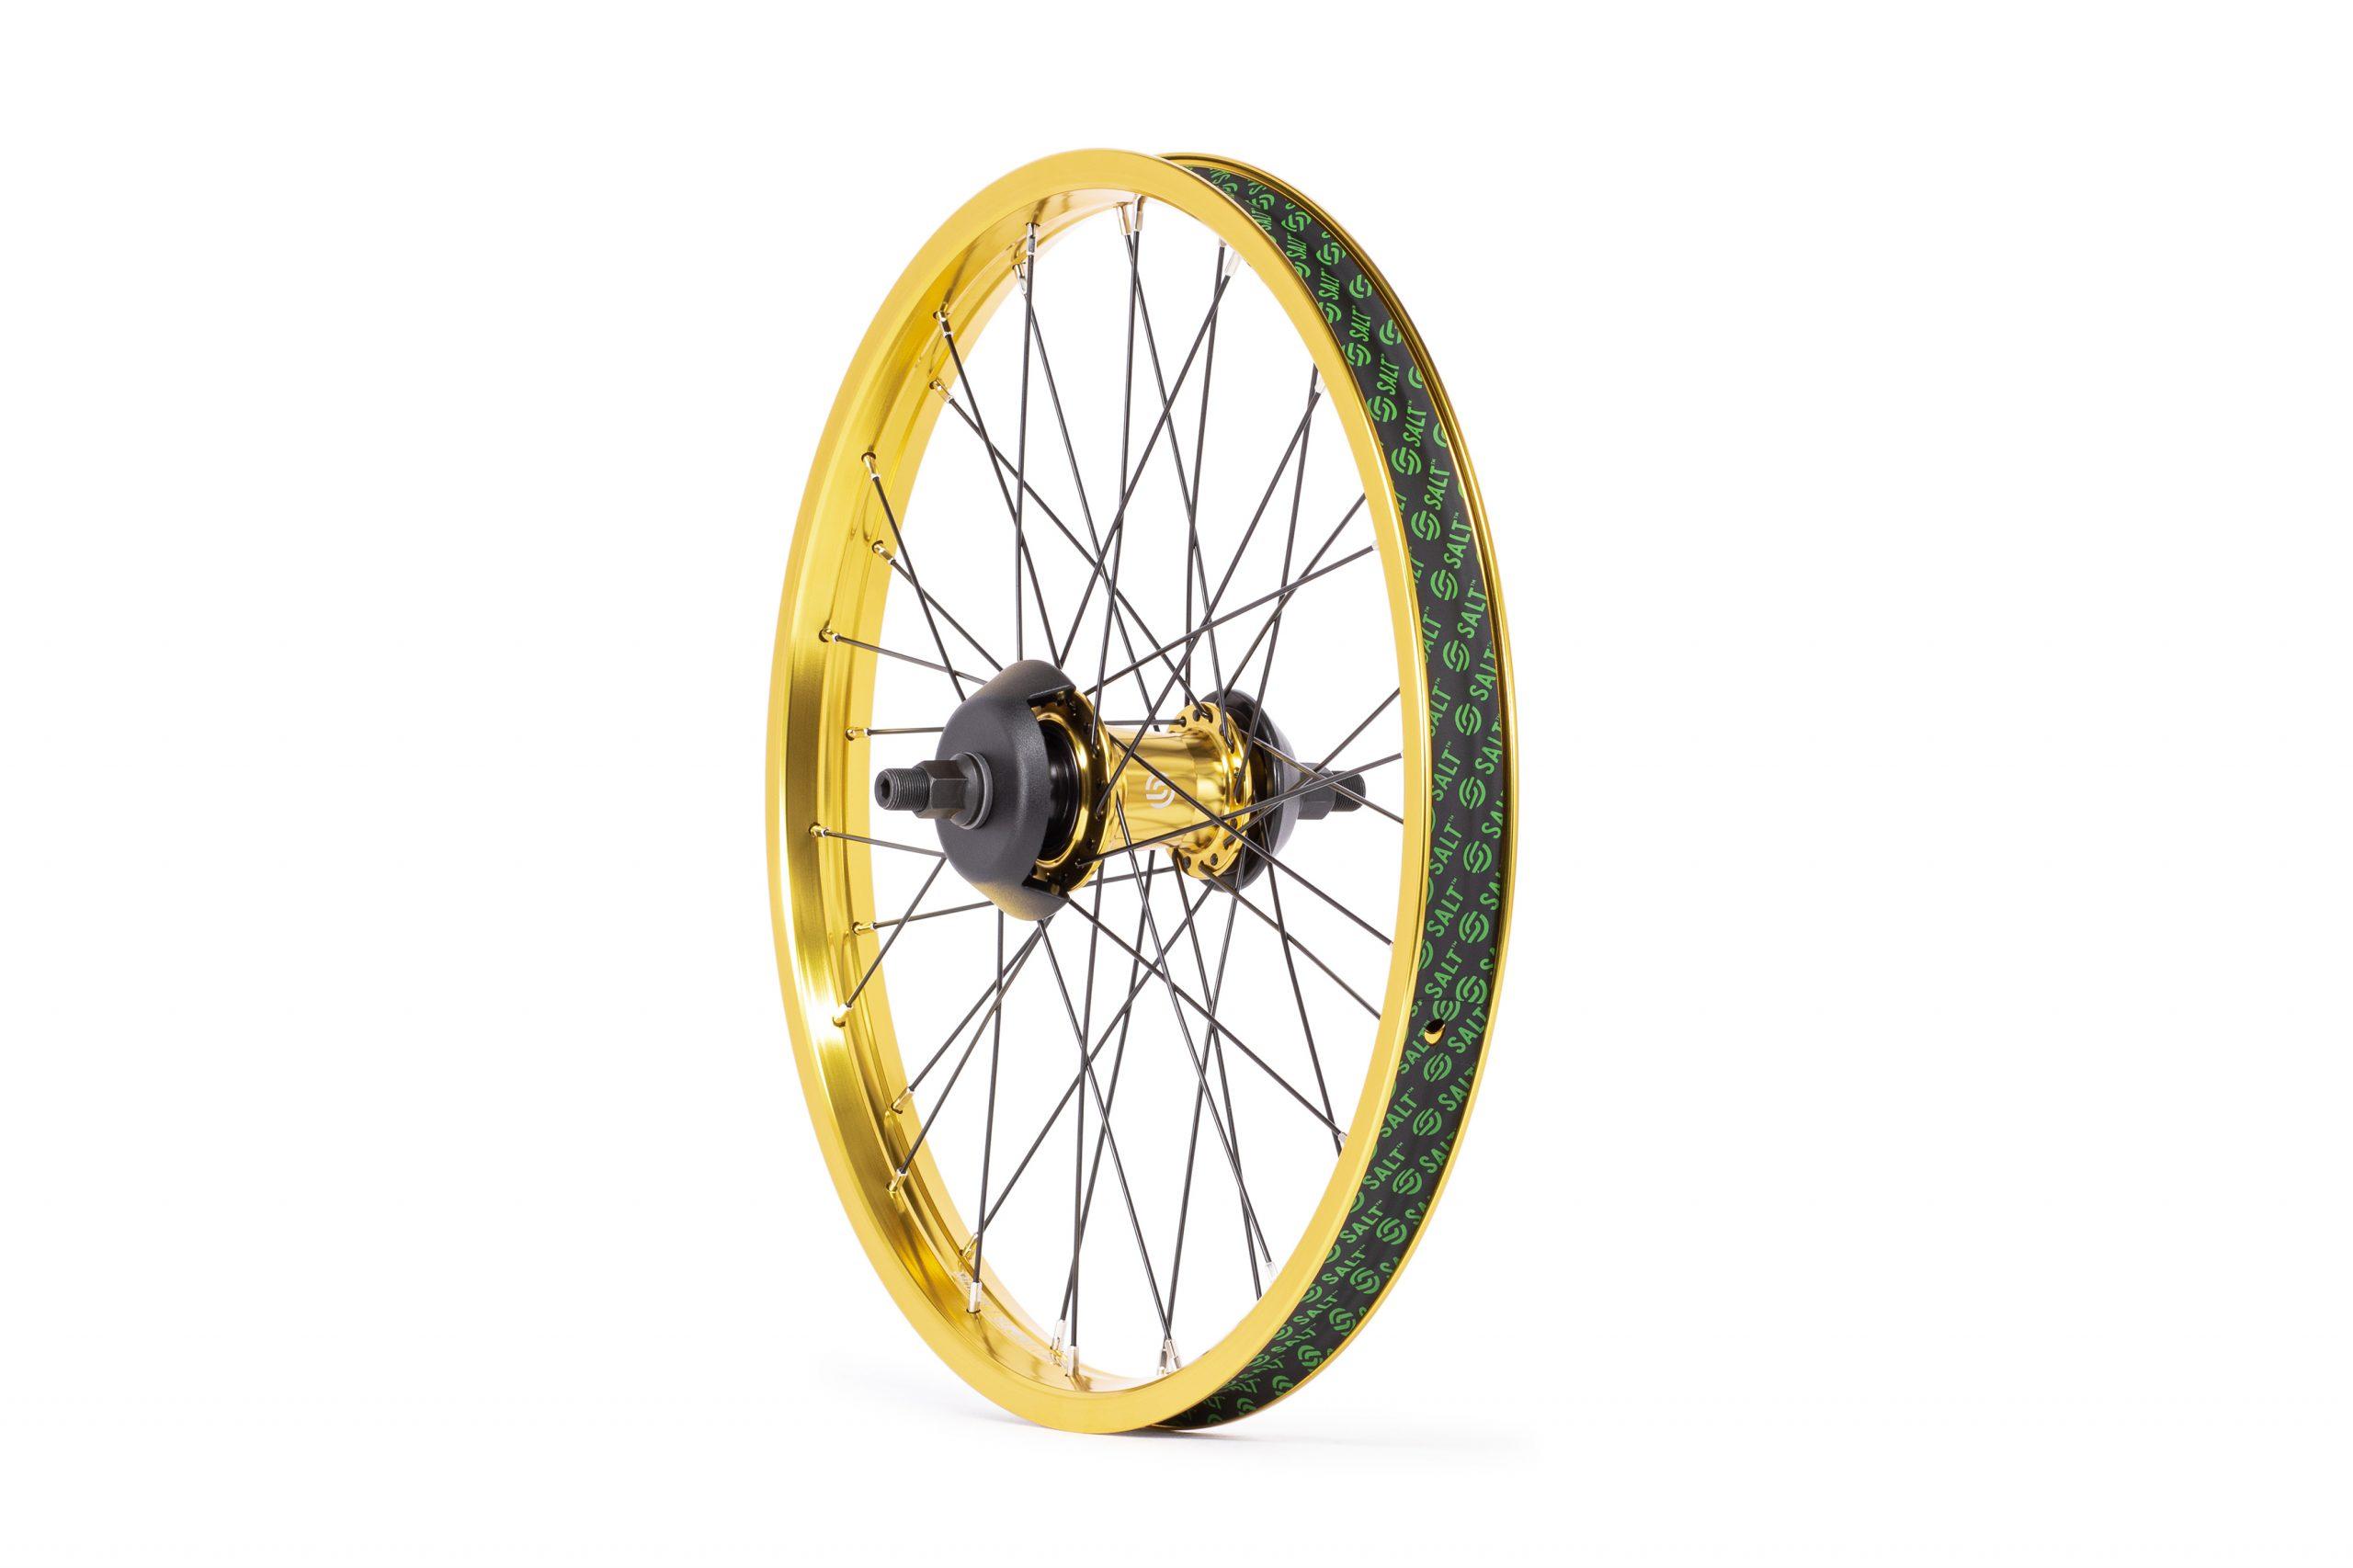 Salt_Everest_FC_rear_wheel_gold-02